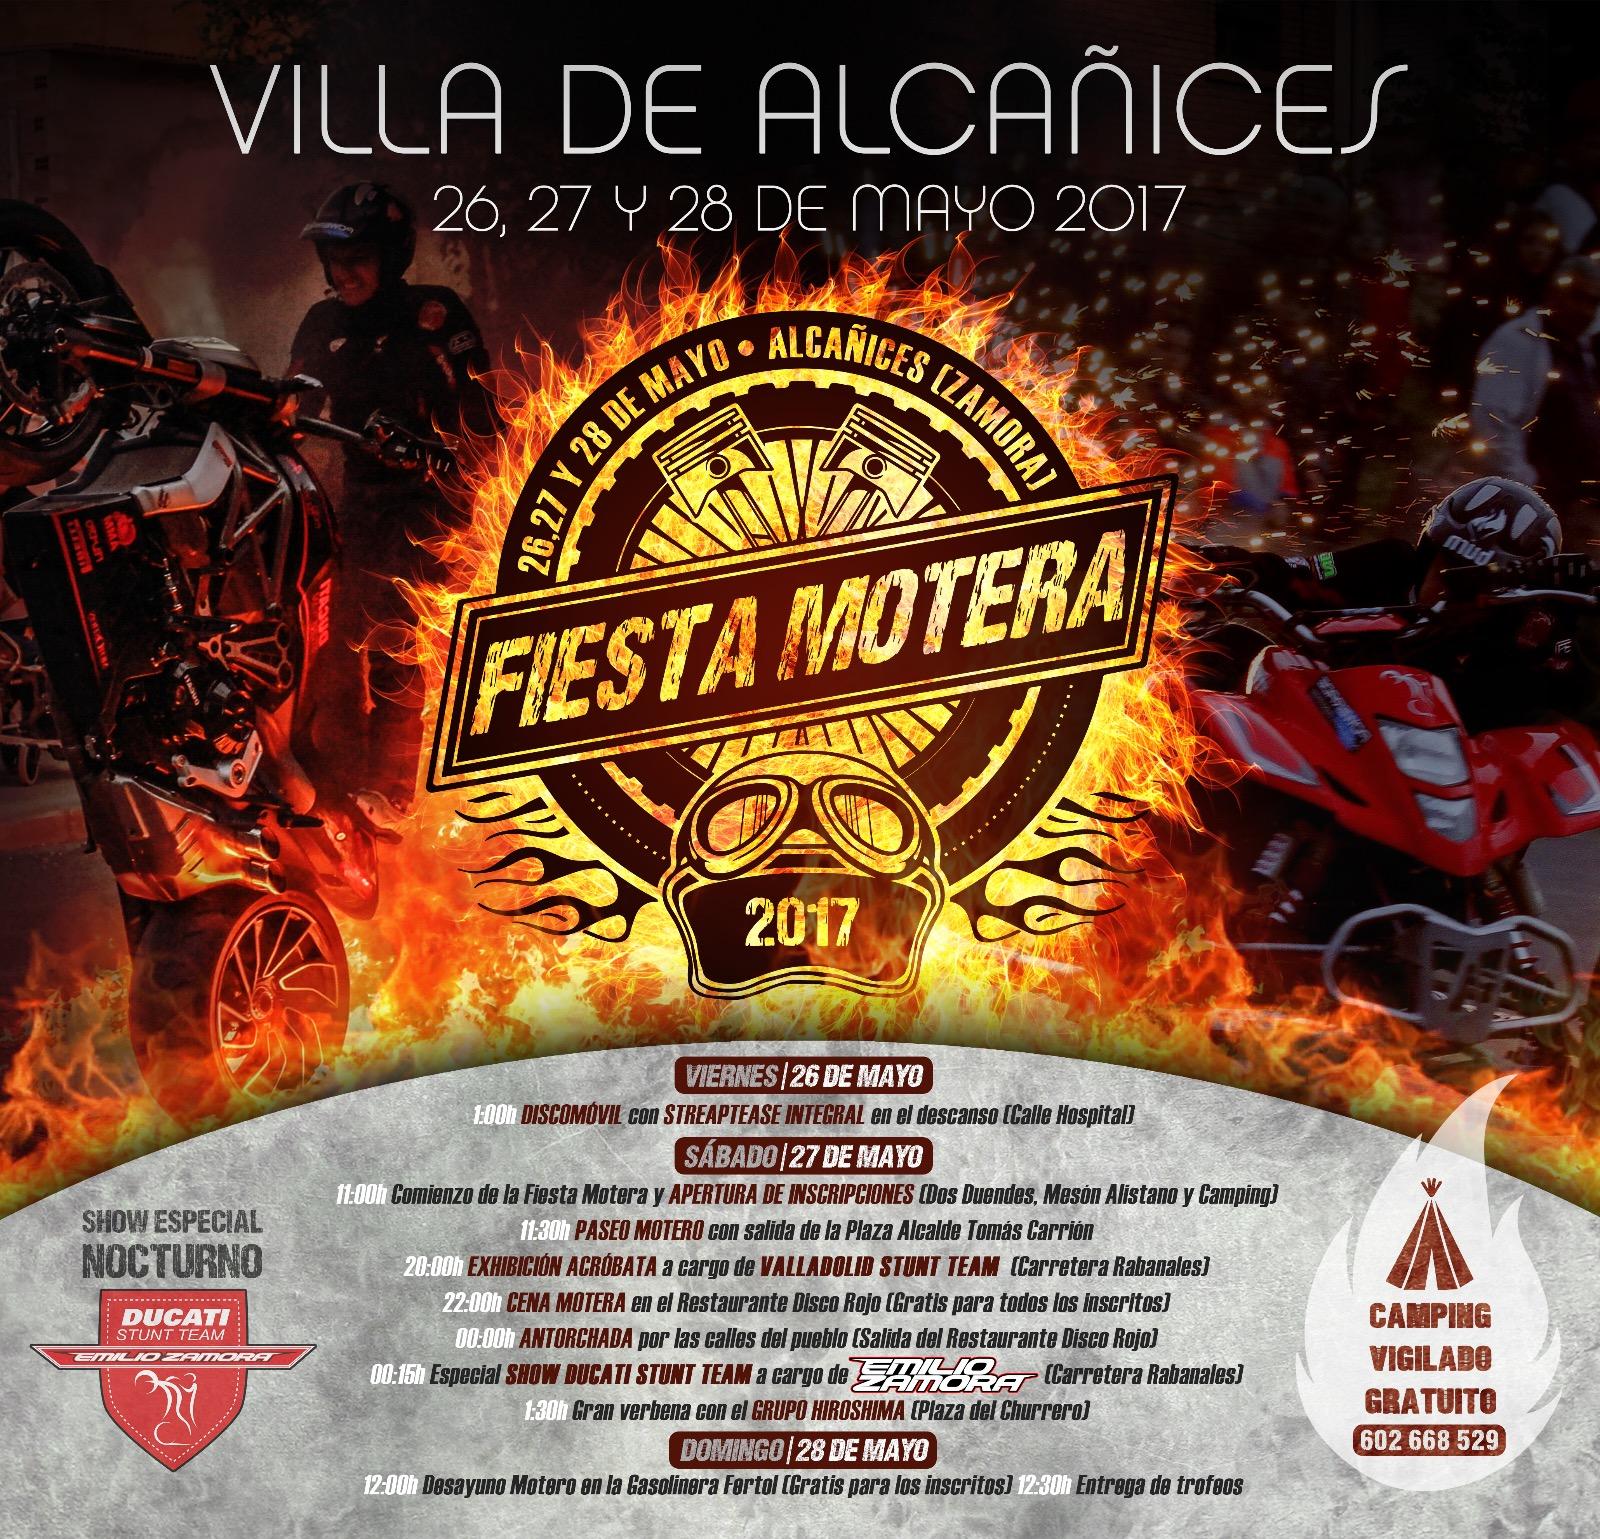 VILLA DE ALCAÑICES_ZAMORA_ALCANICES_CONCENTRACION_2017_ESPECTACULO_MOTOS_EXHIBICION_MOTOR_SHOW_EMILIO_ZAMORA_DUCATI_STUNT_TEAM_FIESTA_MOTORISTA